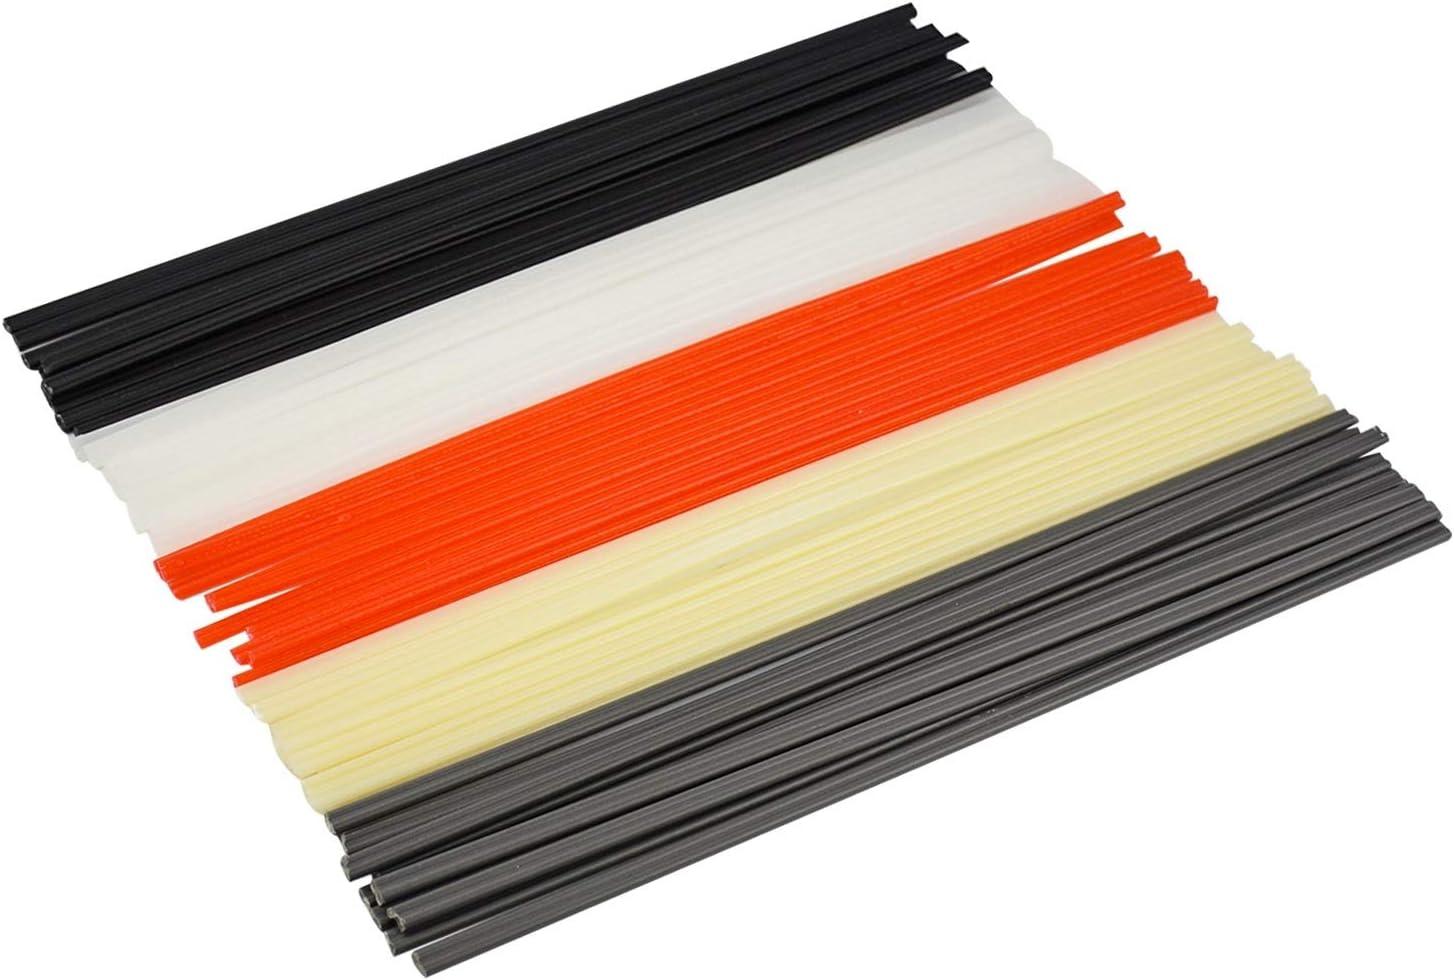 OIMERRY 50PCS 9.8'' Length, PP/PVC/PE Plastic Welder Repair Rods for Hot Air Heat Gun